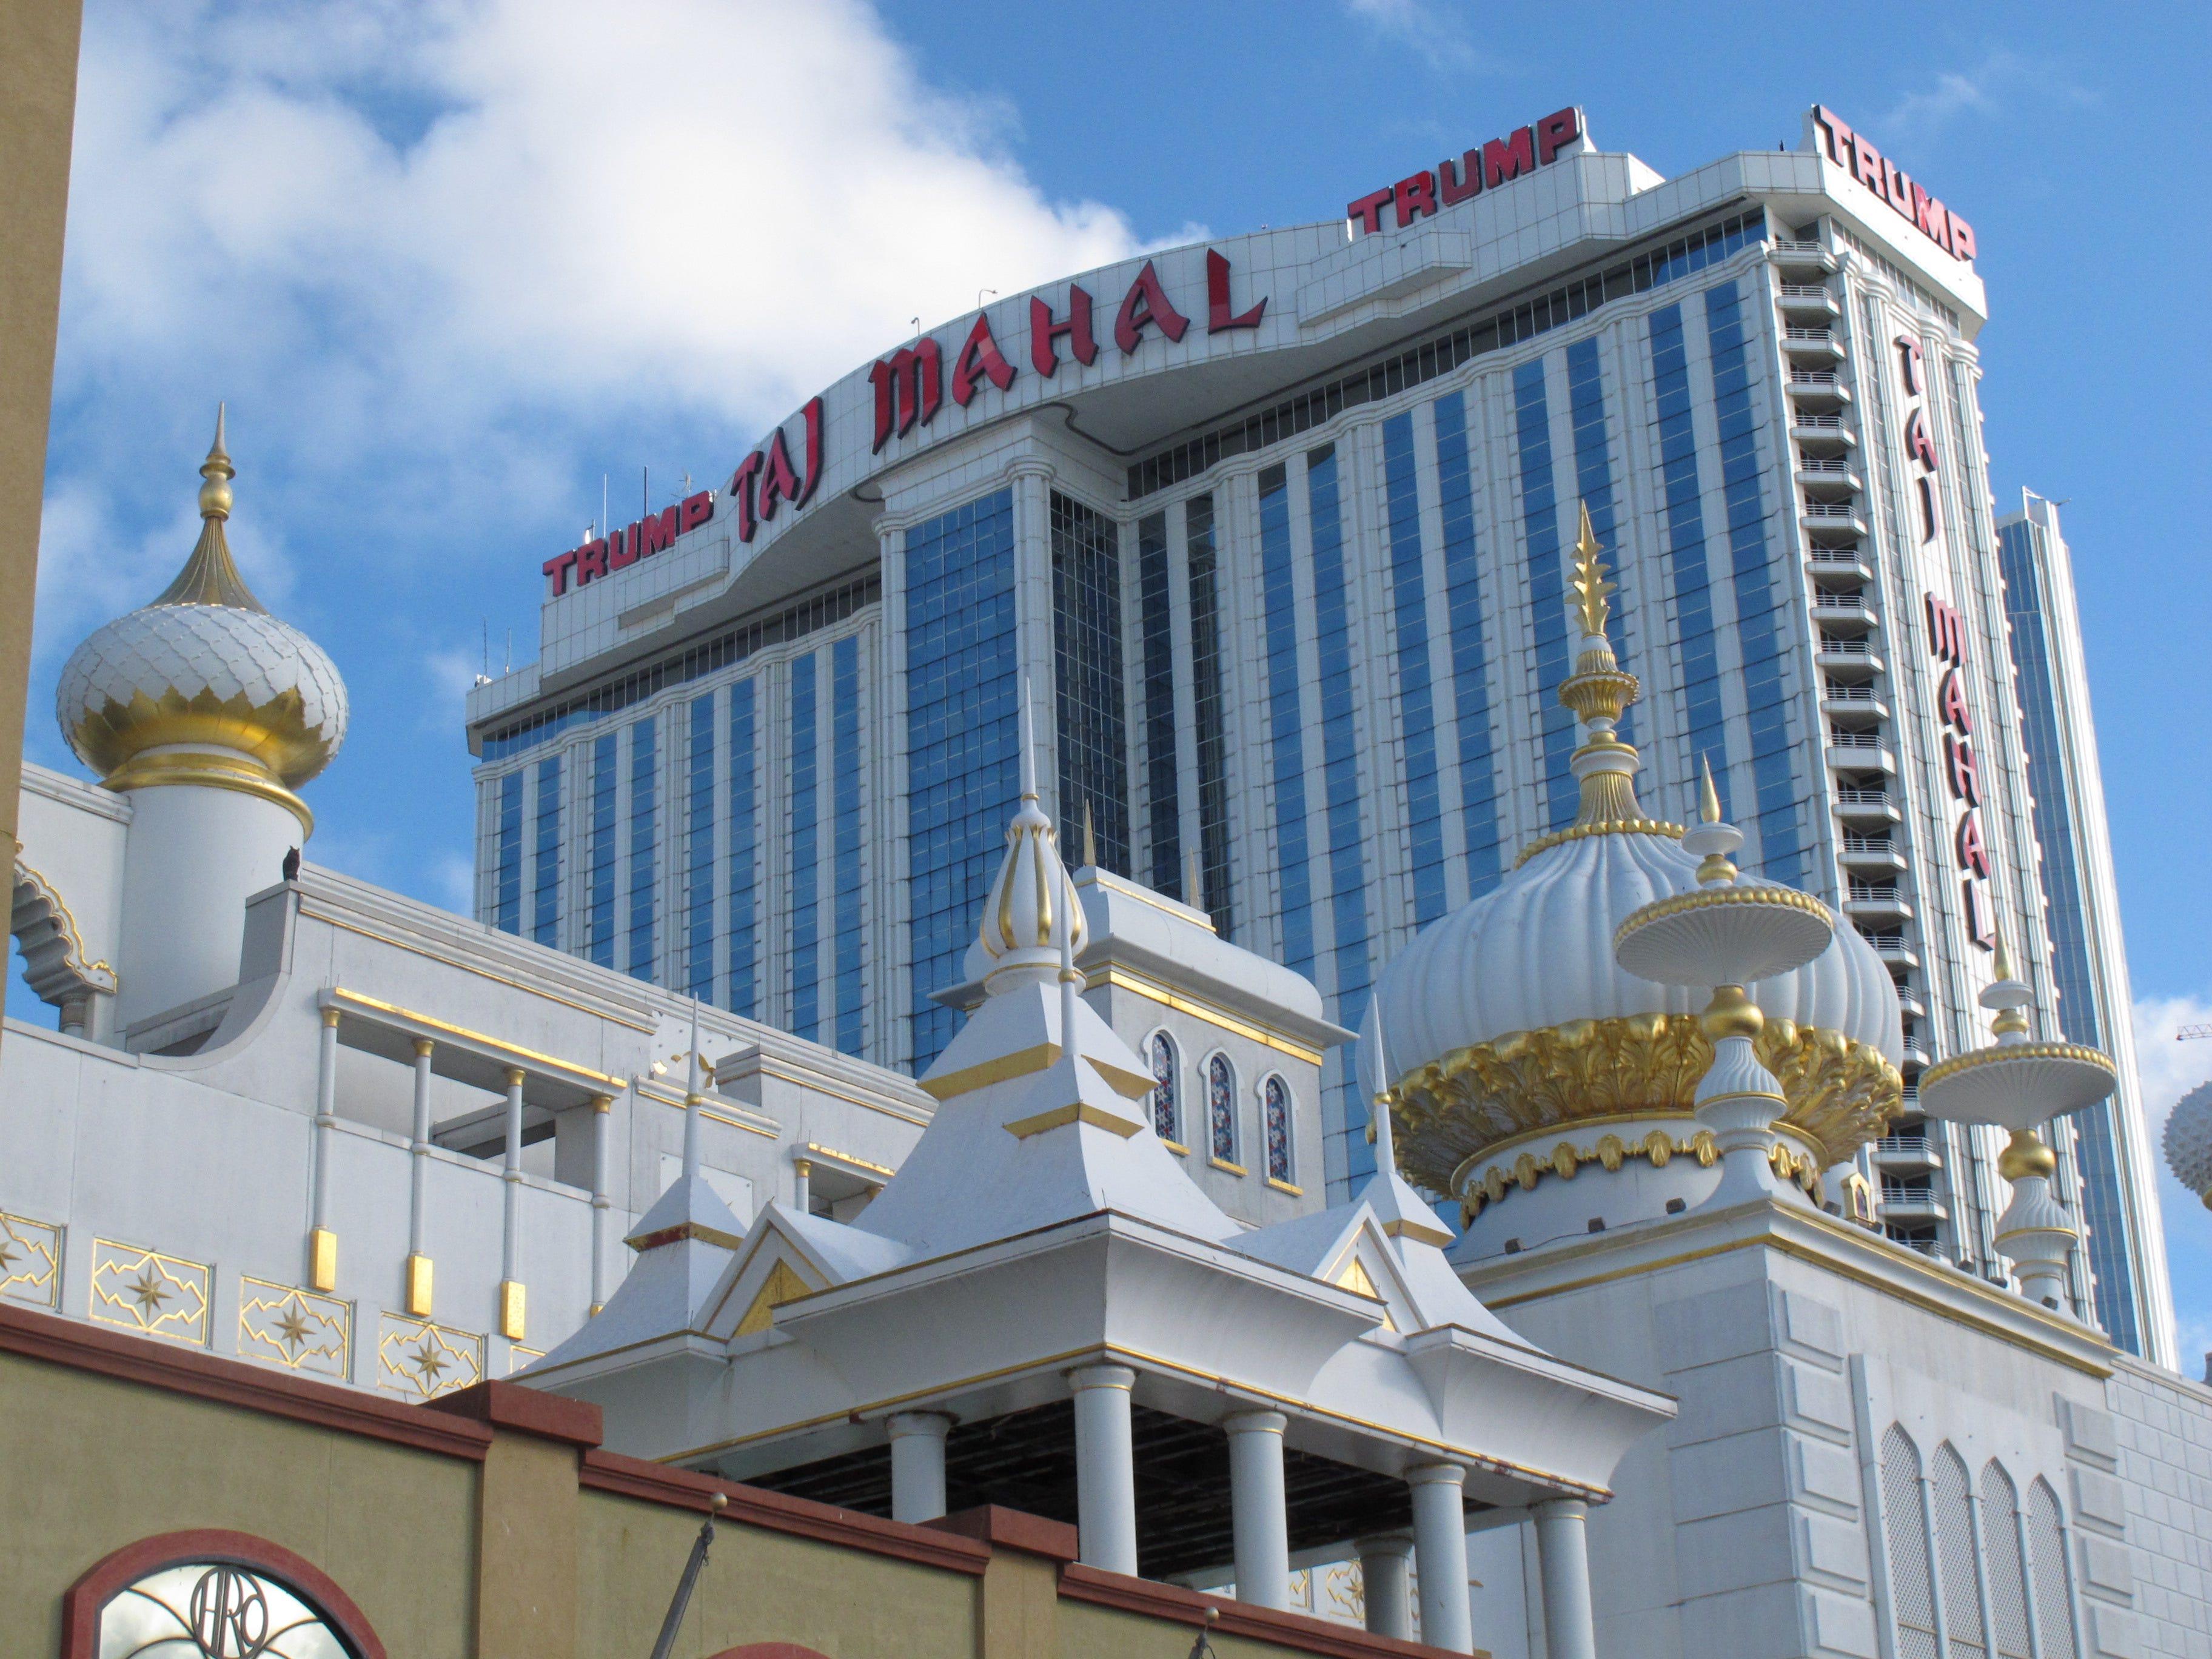 Icahn says Taj Mahal casino likely to close